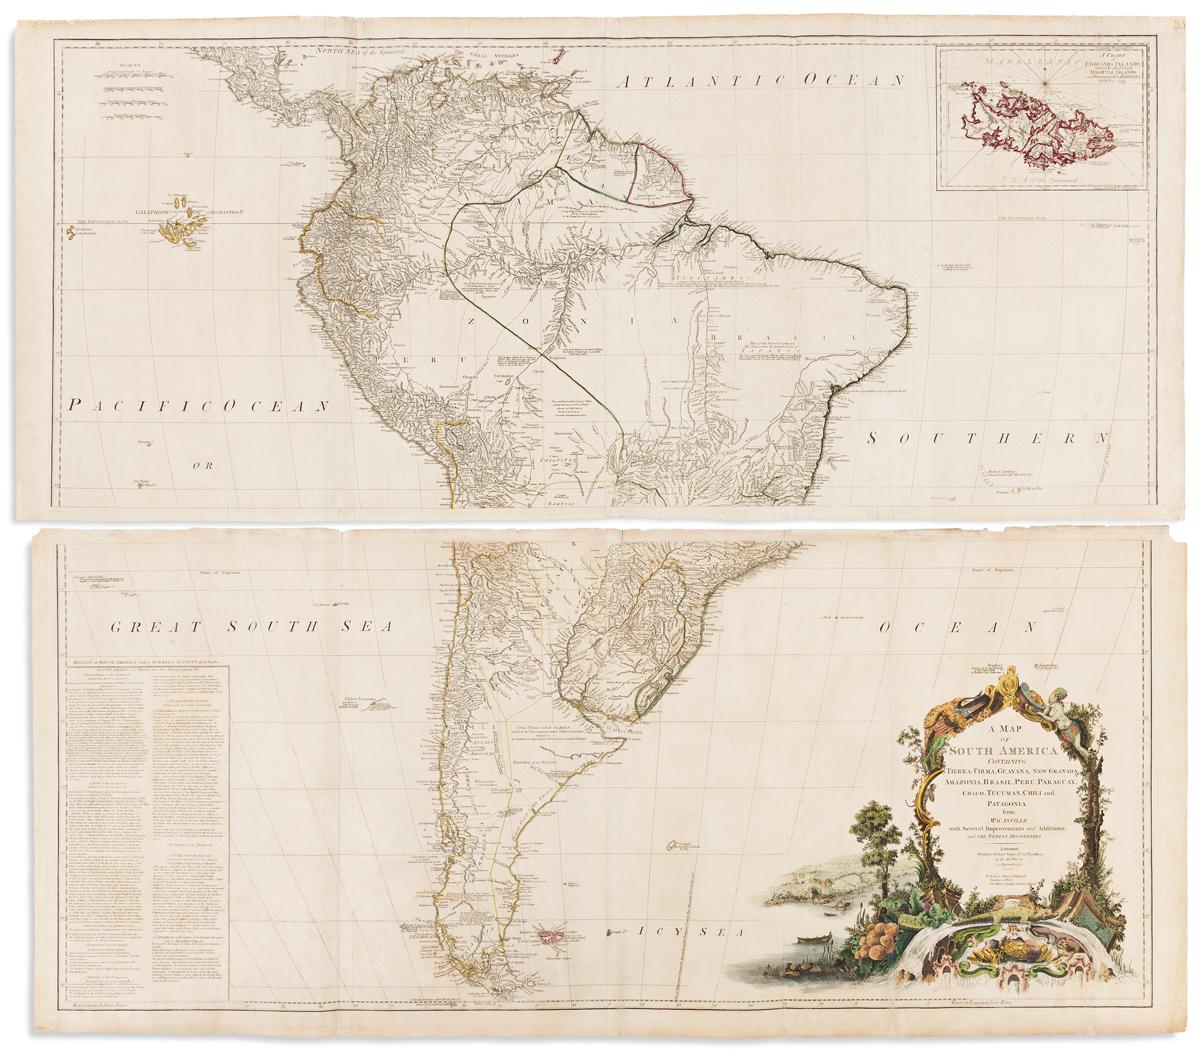 JEFFERYS, THOMAS; after J.B. DANVILLE. A Map of South America